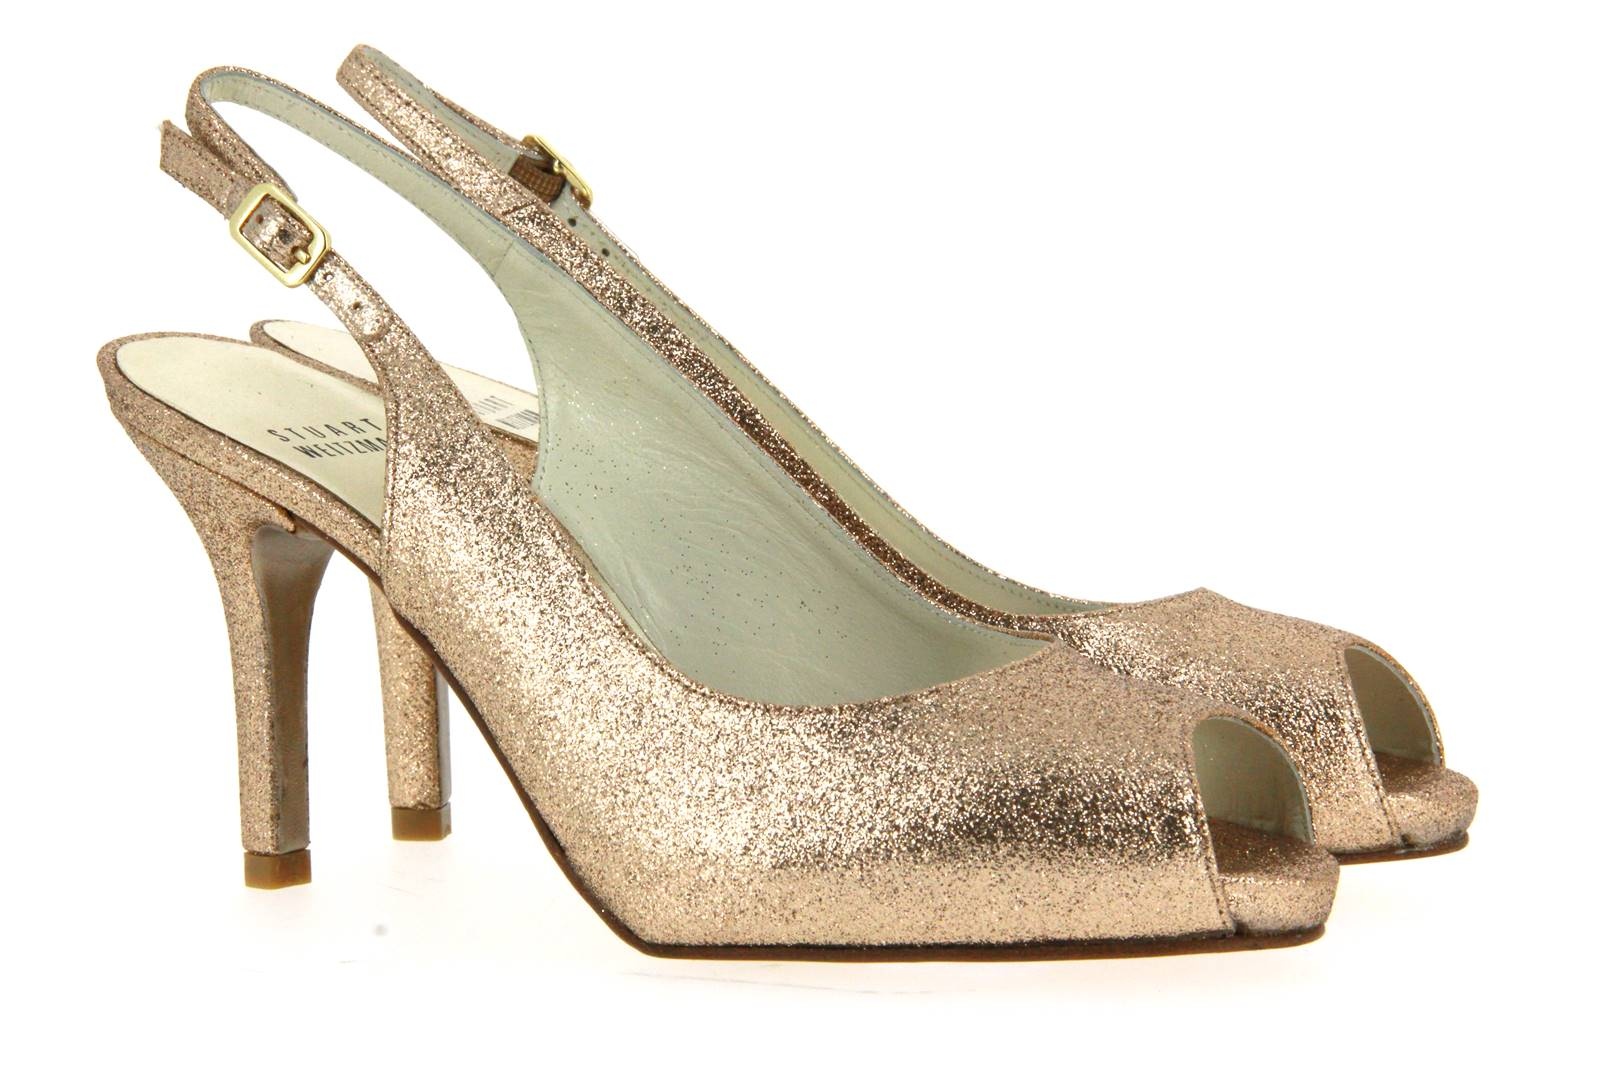 Stuart Weitzman sandal LITLEY SAND MINI GLITTER